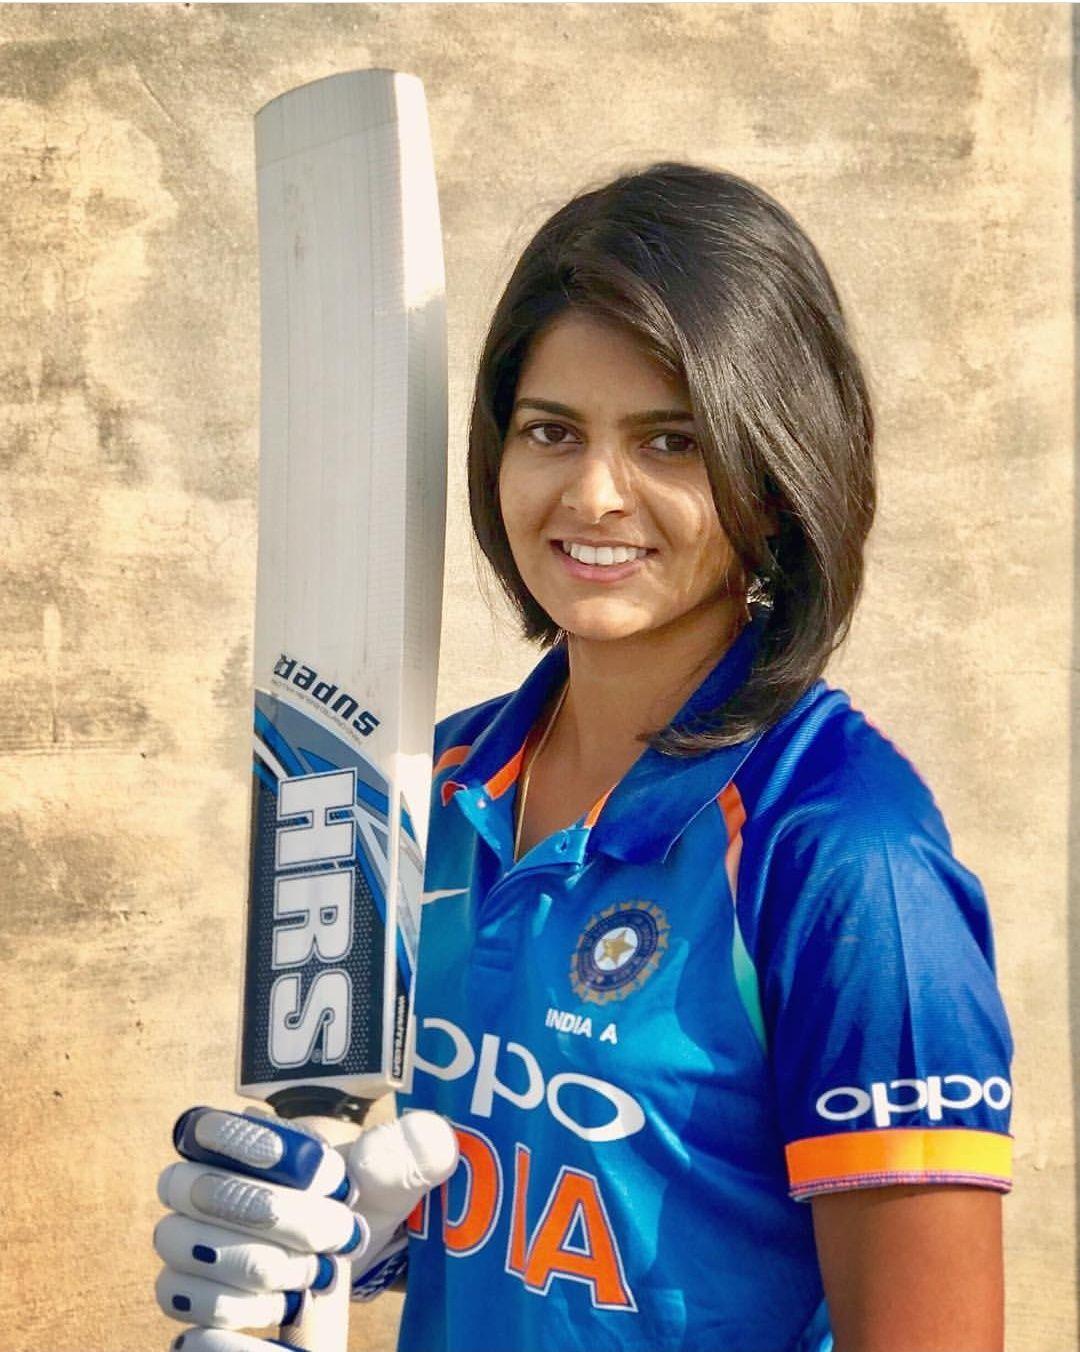 Top 6 Photos From Priya Punia S Instagram Account Priya Punia Priya Punia Cricketer Priya Punia I 10 Most Beautiful Women Cricket Sport England Cricket Team